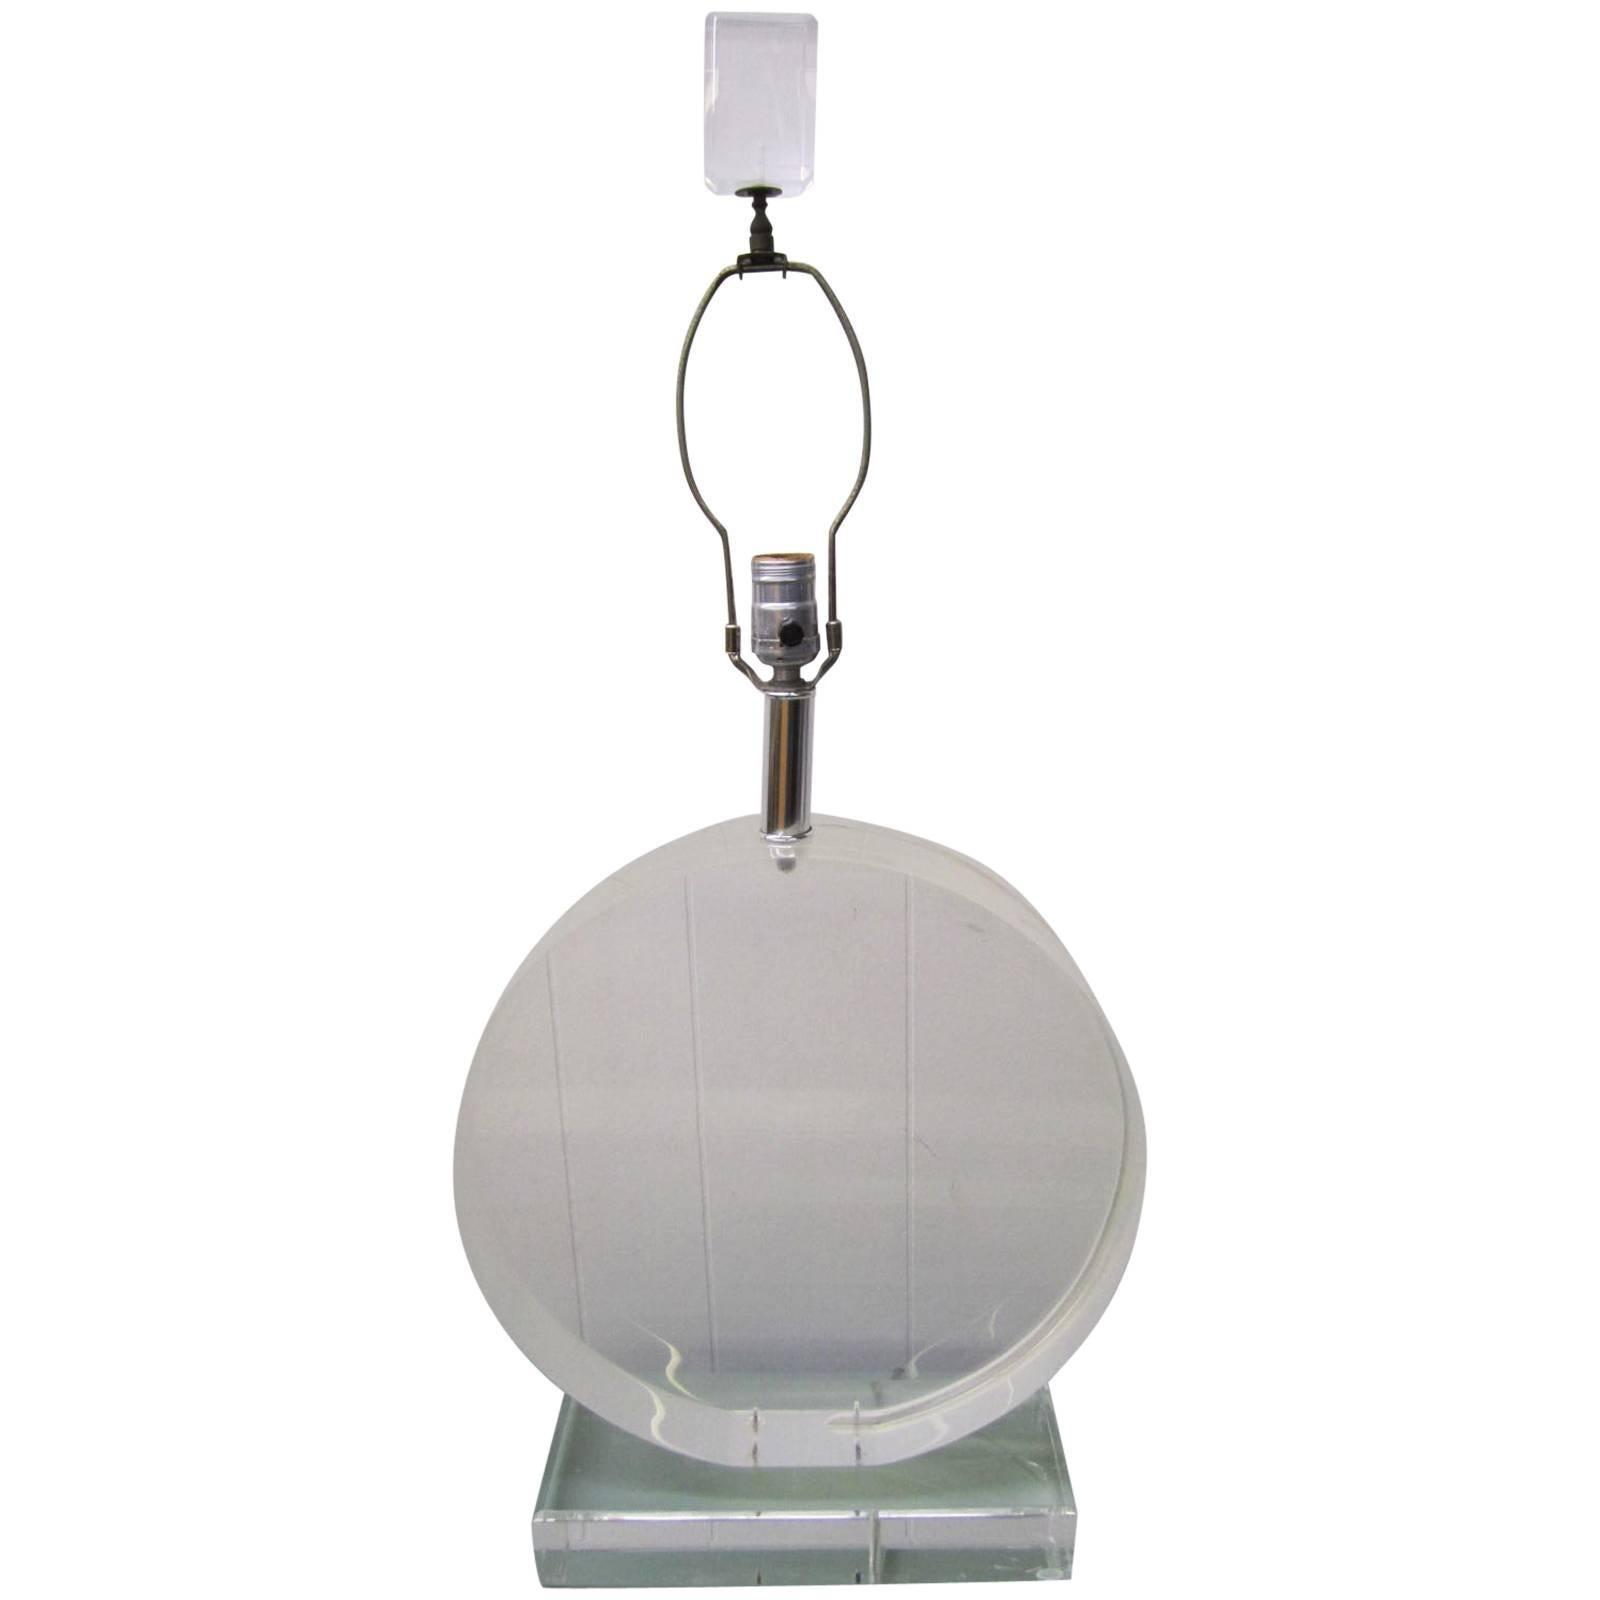 Large-Scale Karl Springer Style Circular Lucite Lamp Hollywood Regency Modern